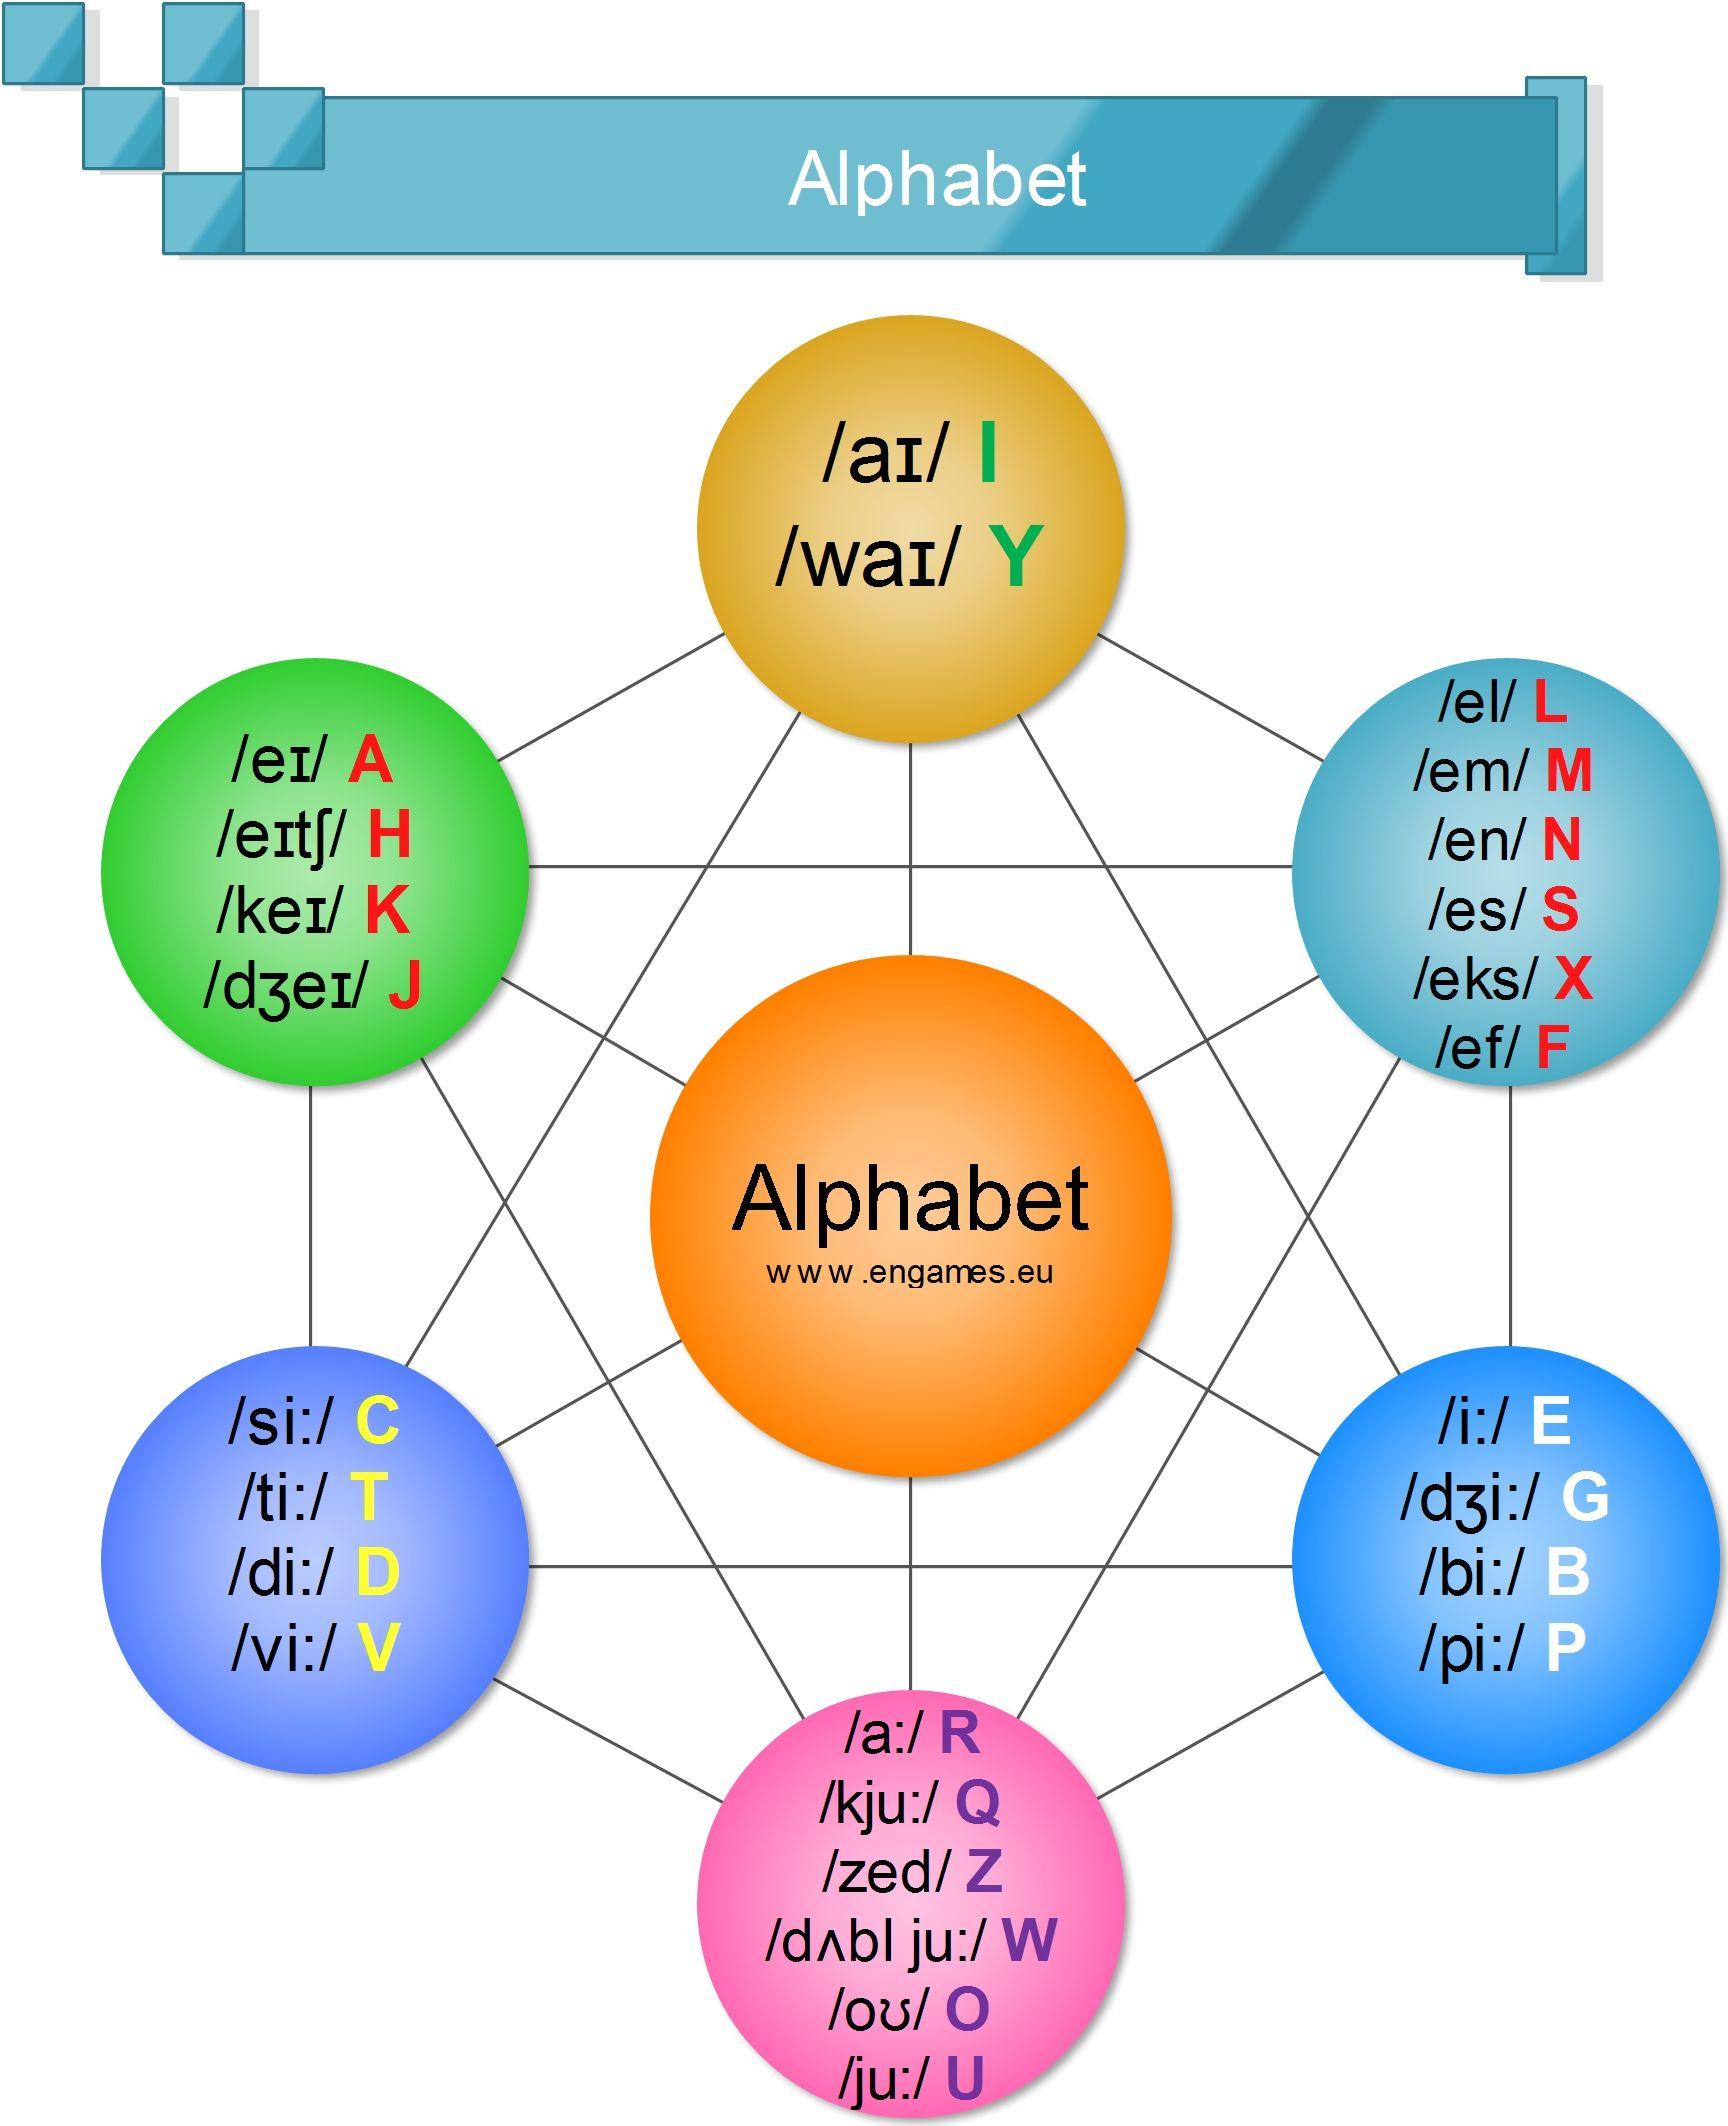 Alphabet Audio Lingual Method